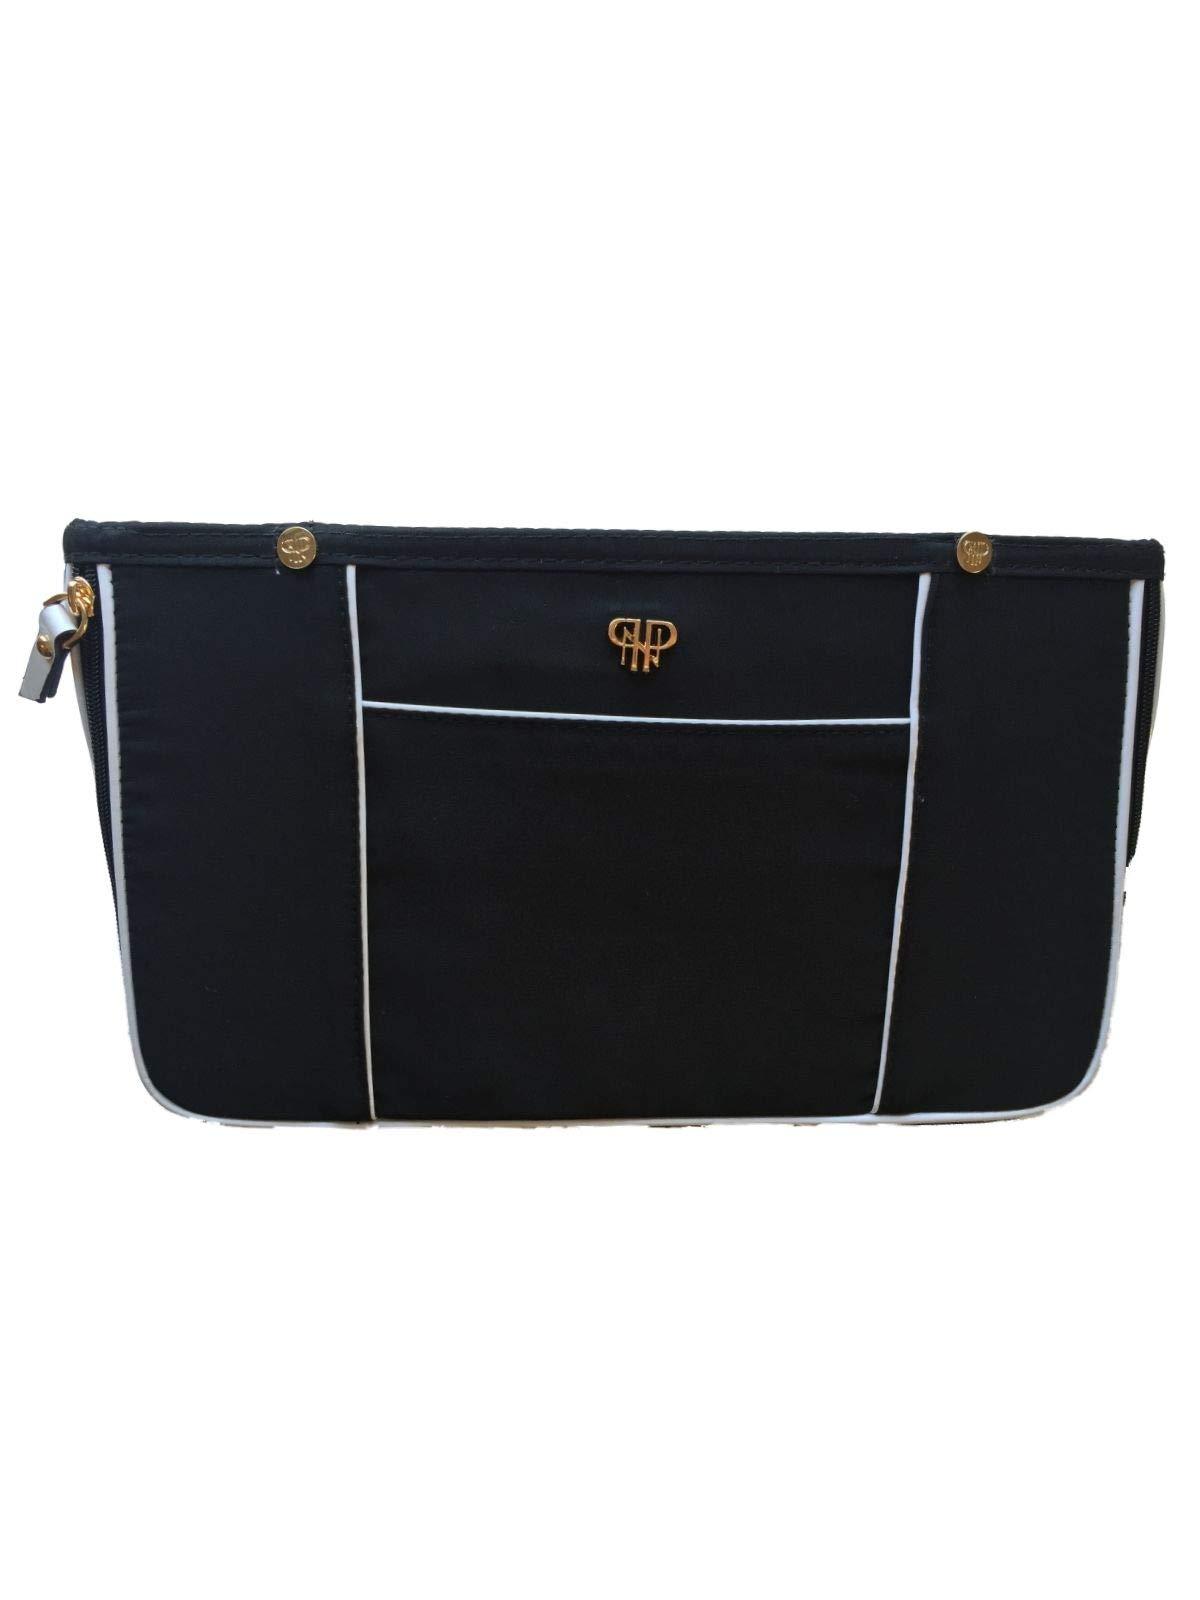 PurseN Handbag Organizer Insert (Small, Blanc Noir) by PurseN (Image #2)